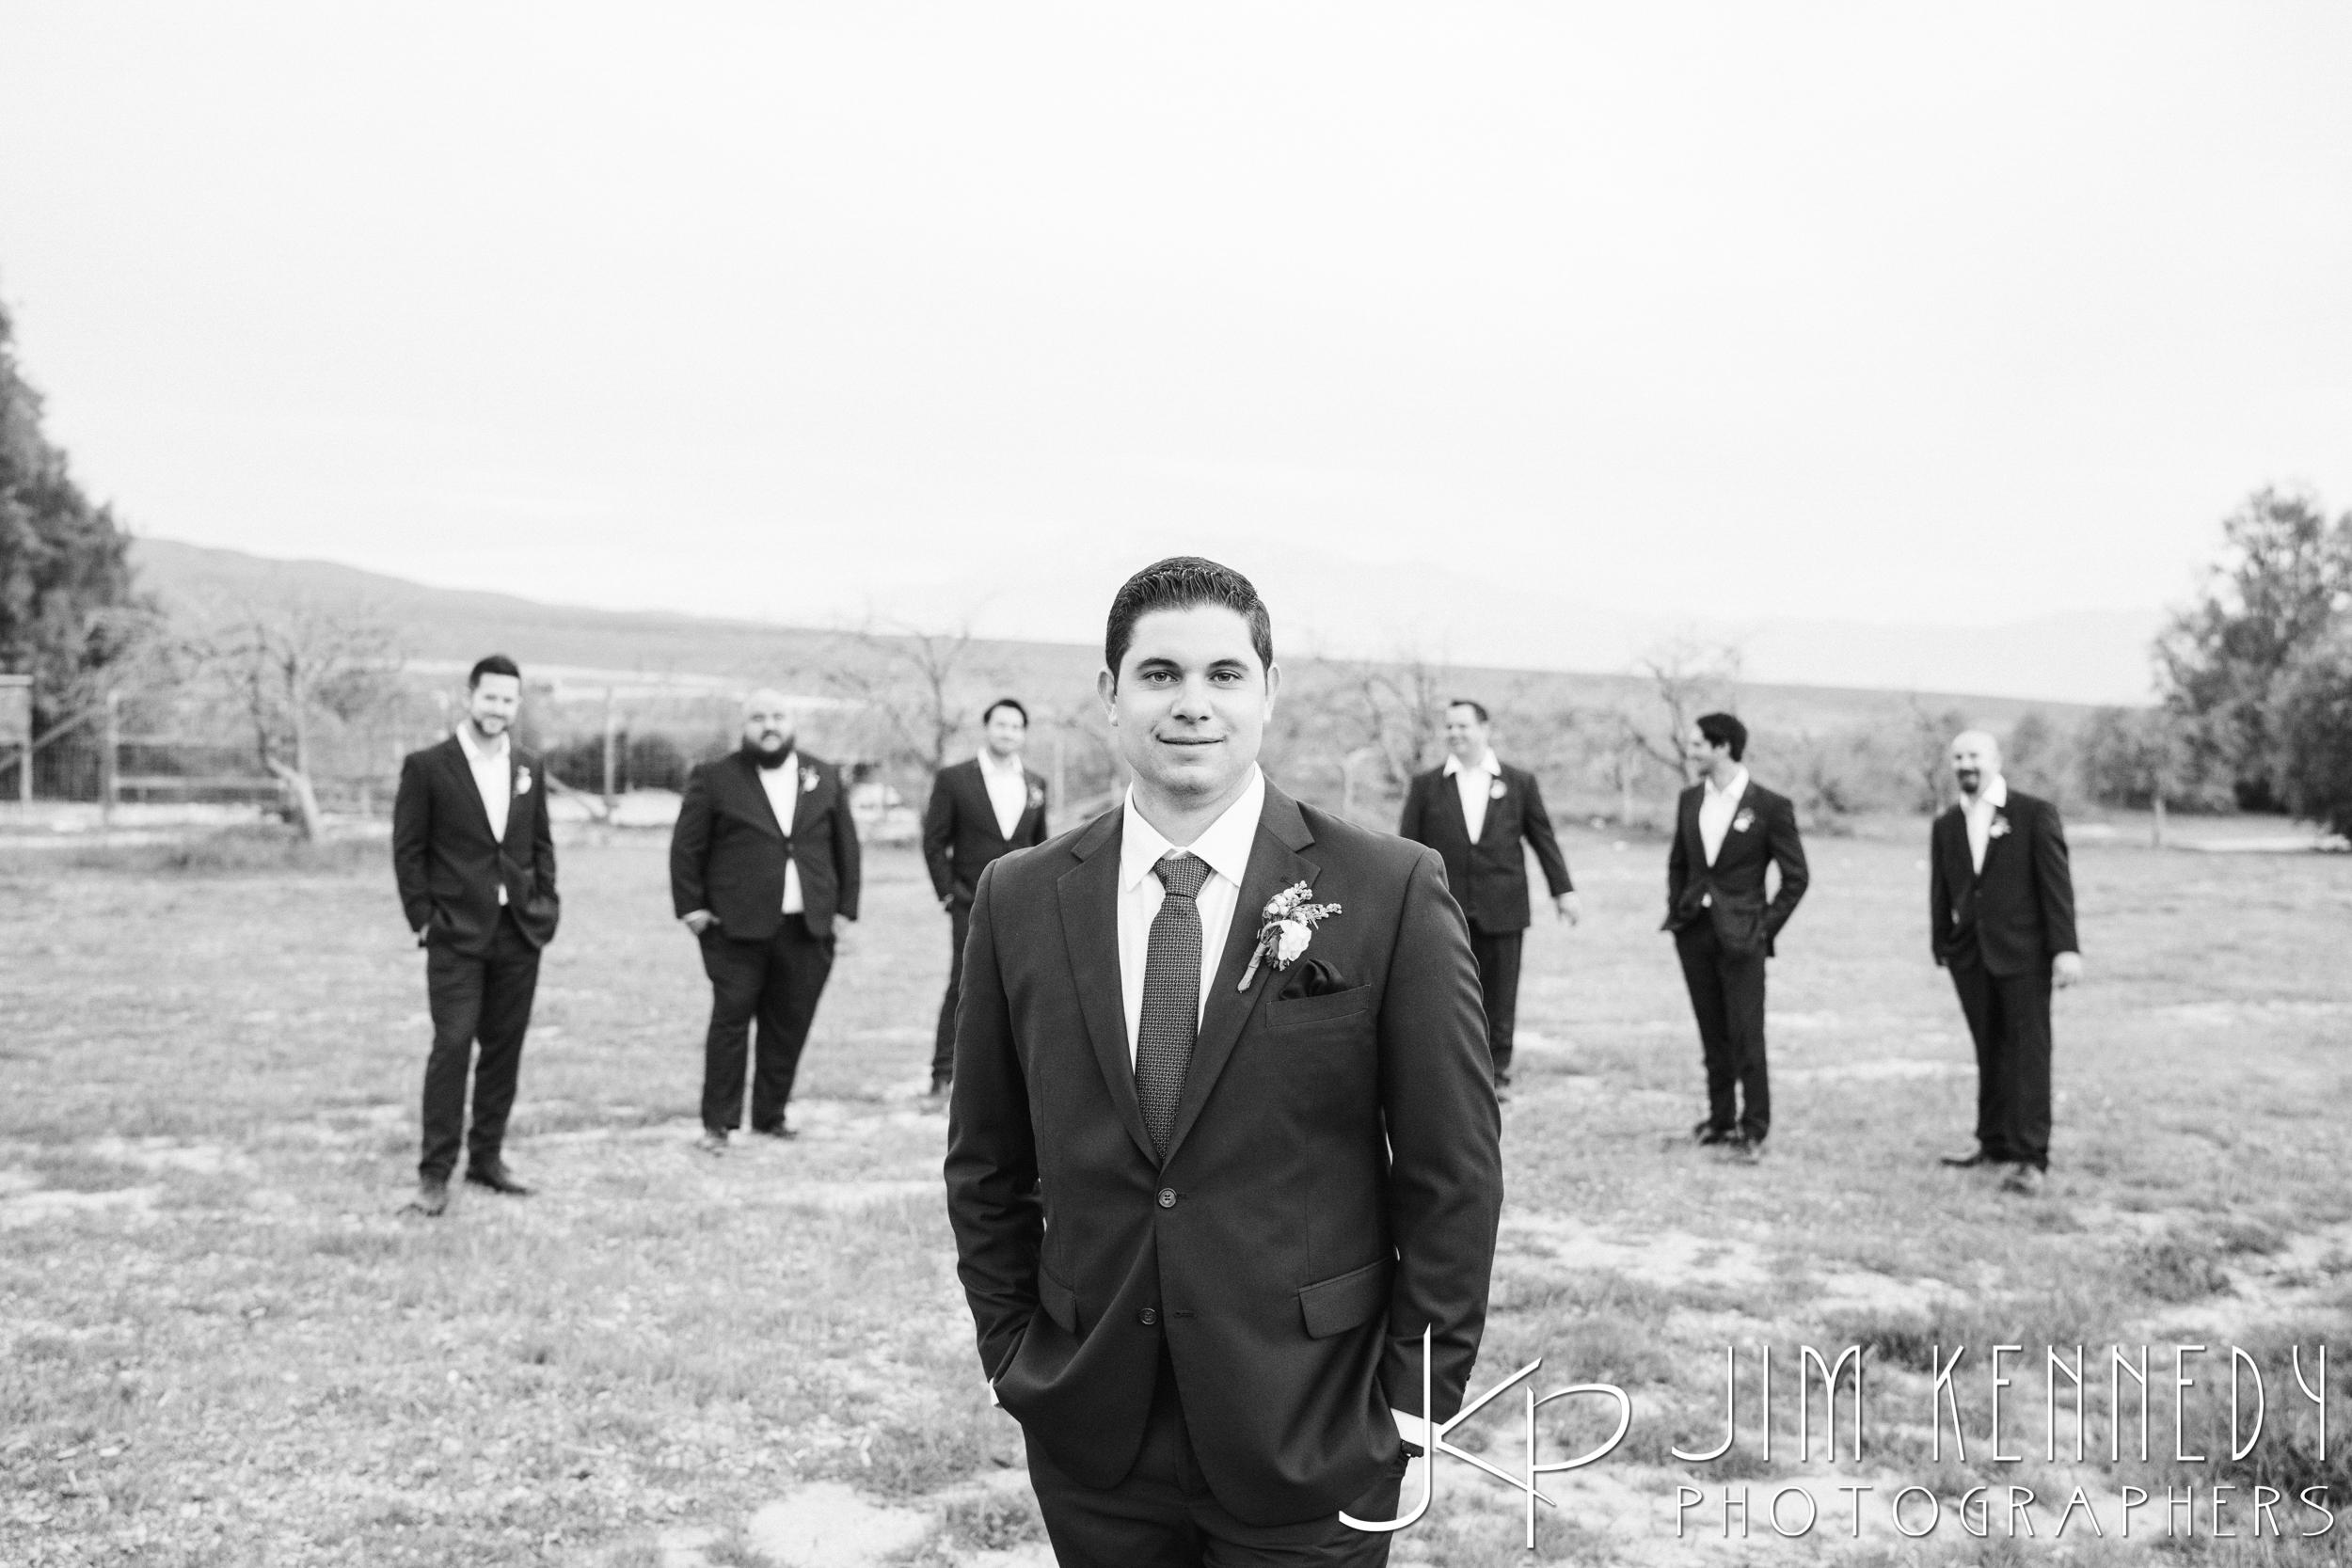 jim_kennedy_photographers_highland_springs_wedding_caitlyn_0143.jpg